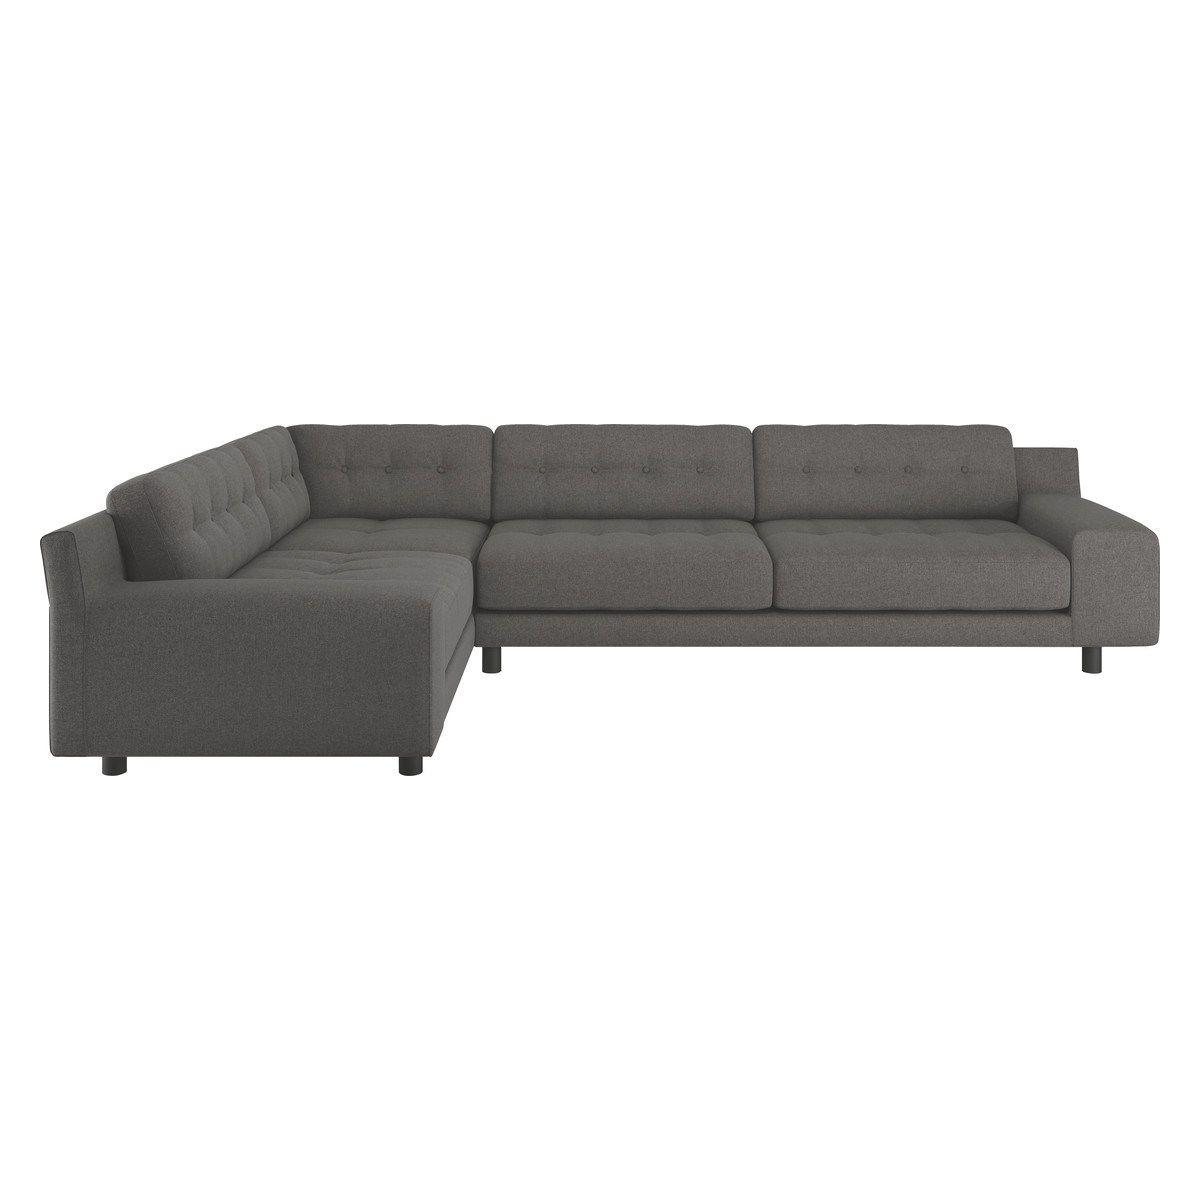 Flake Fabric Right Corner Sofa In Grey With Metal Legs Corner Sofa Sofa Fabric Sofa